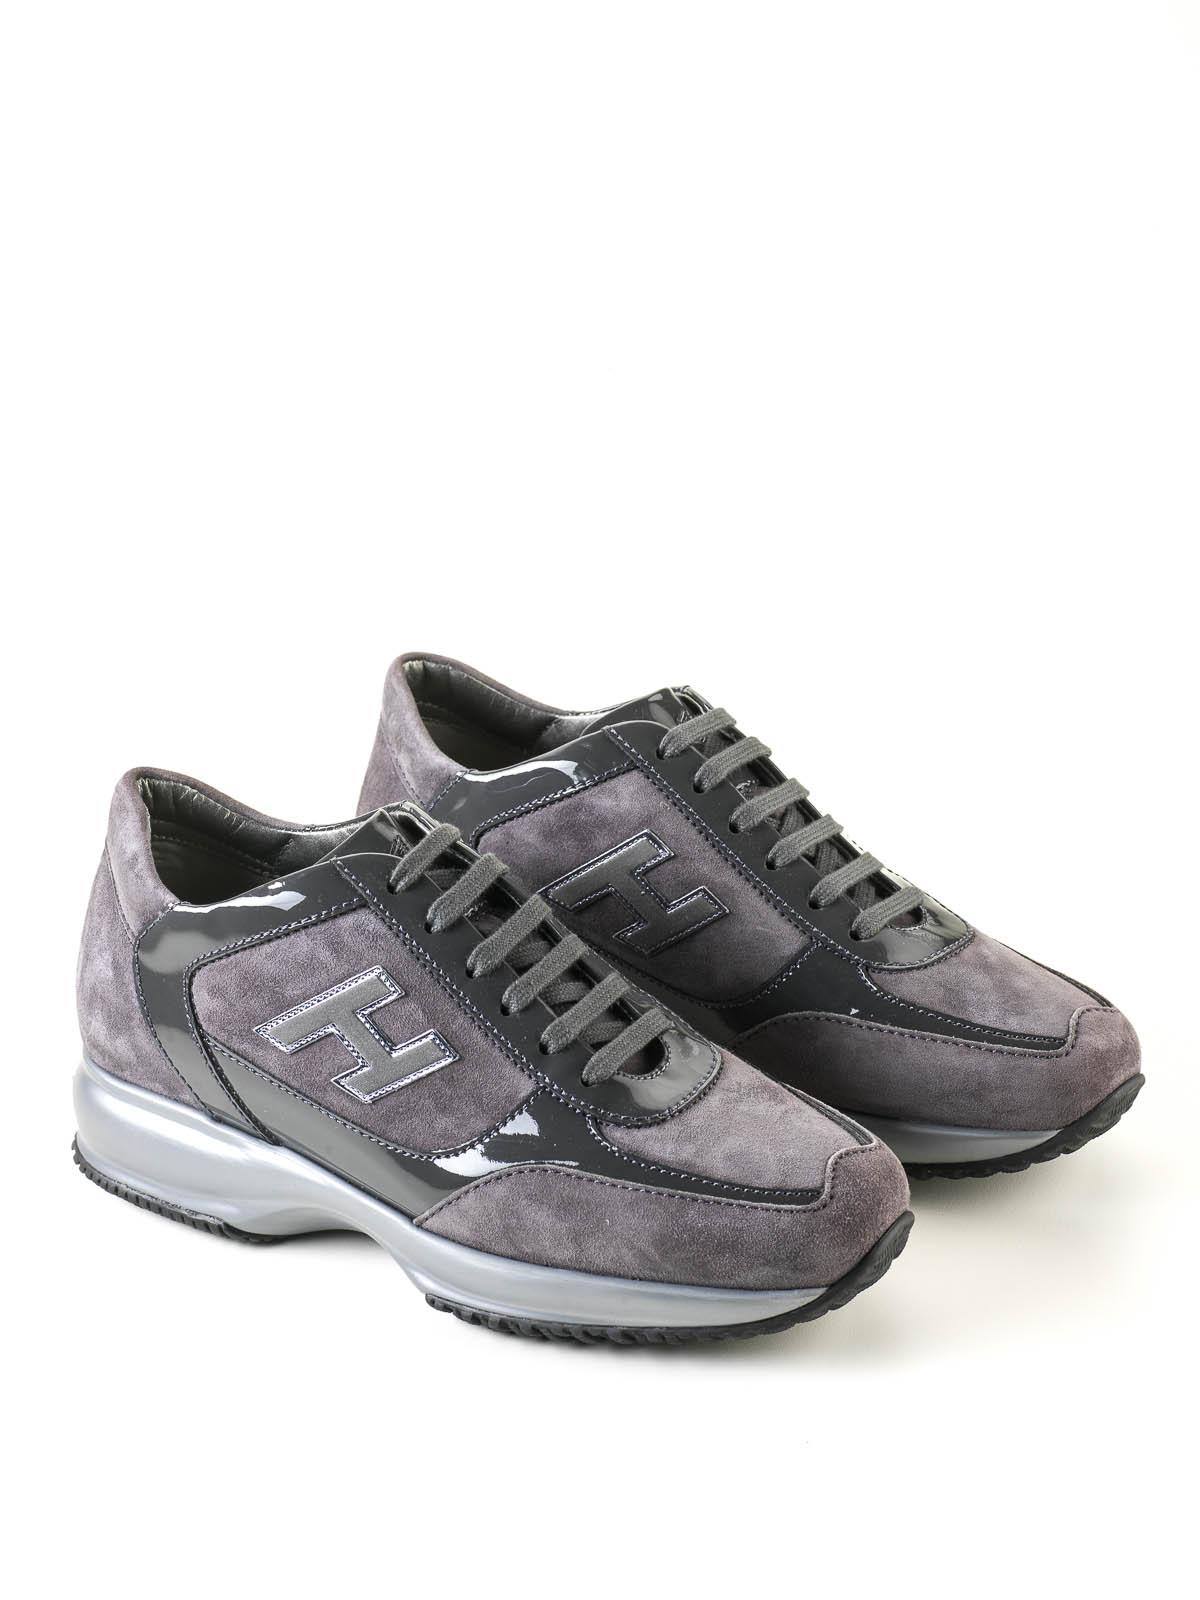 Hogan - Sneaker Fur Damen - Grau - Sneaker - HXW00N02582 IU3 9996 46cc65d68d